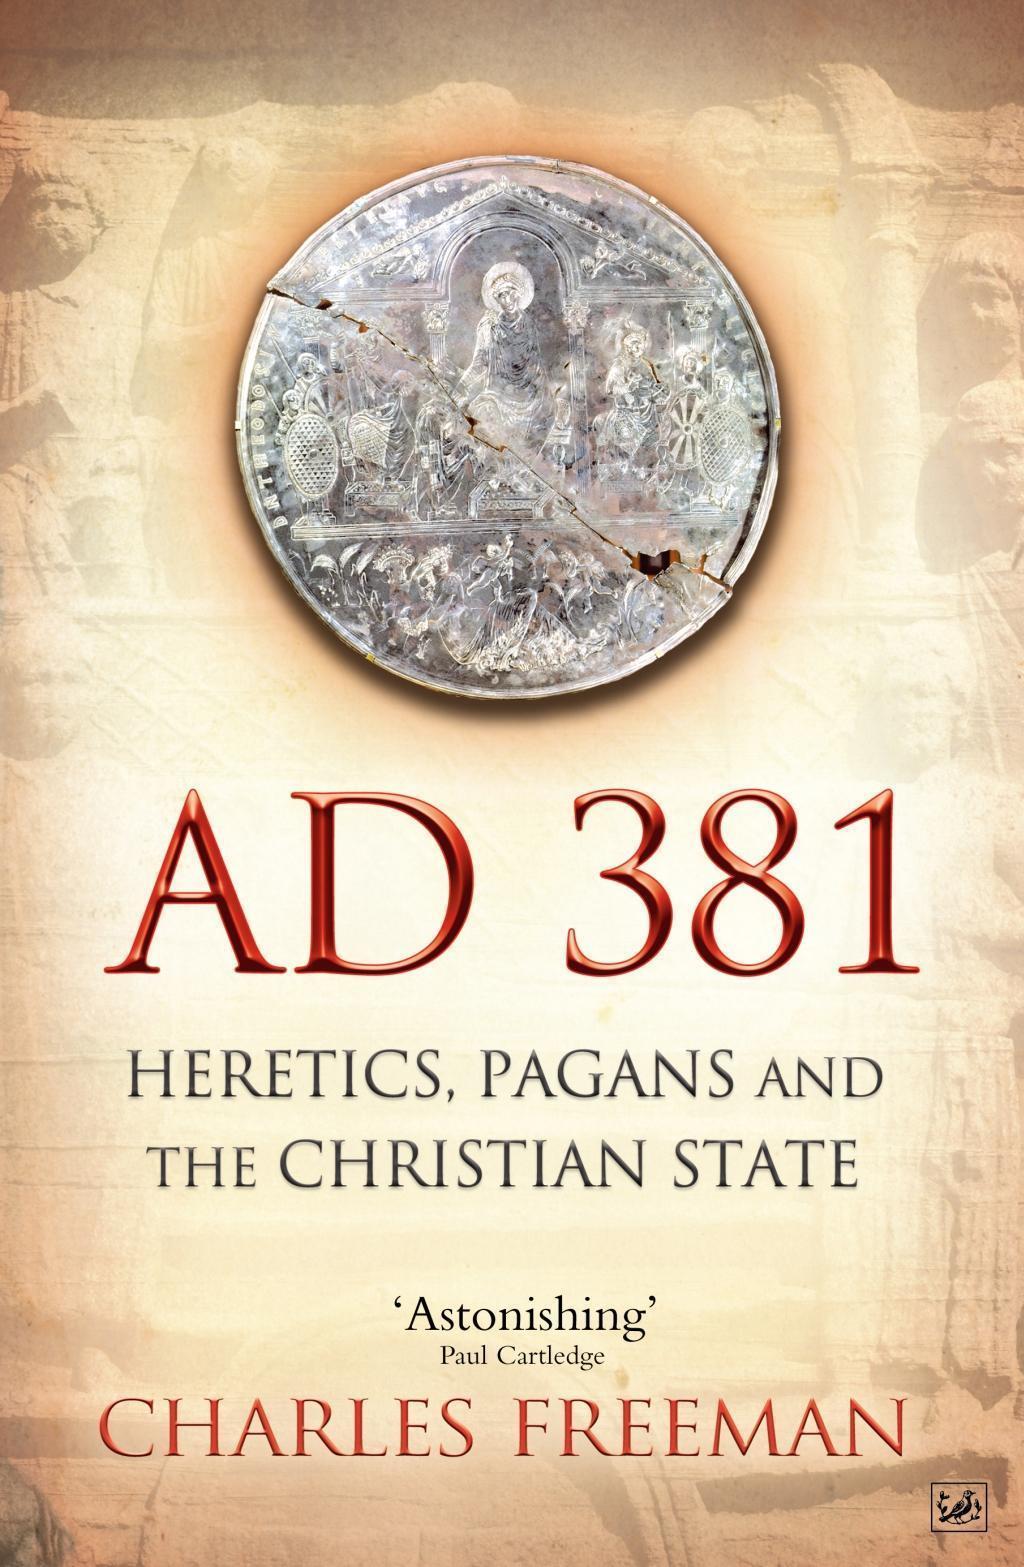 AD 381